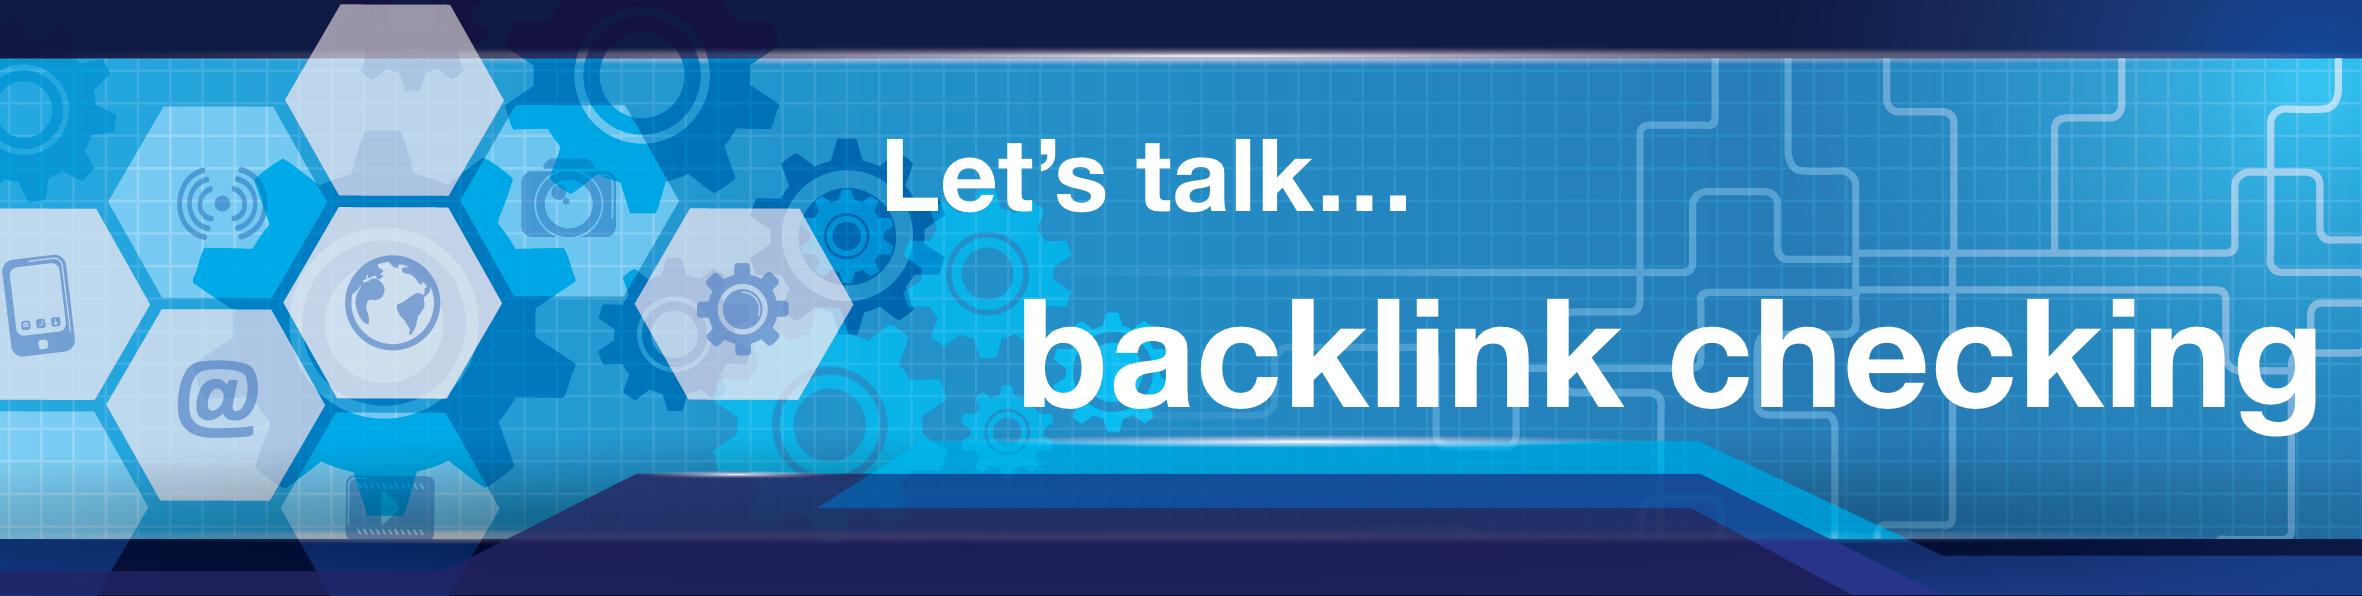 backlink checking